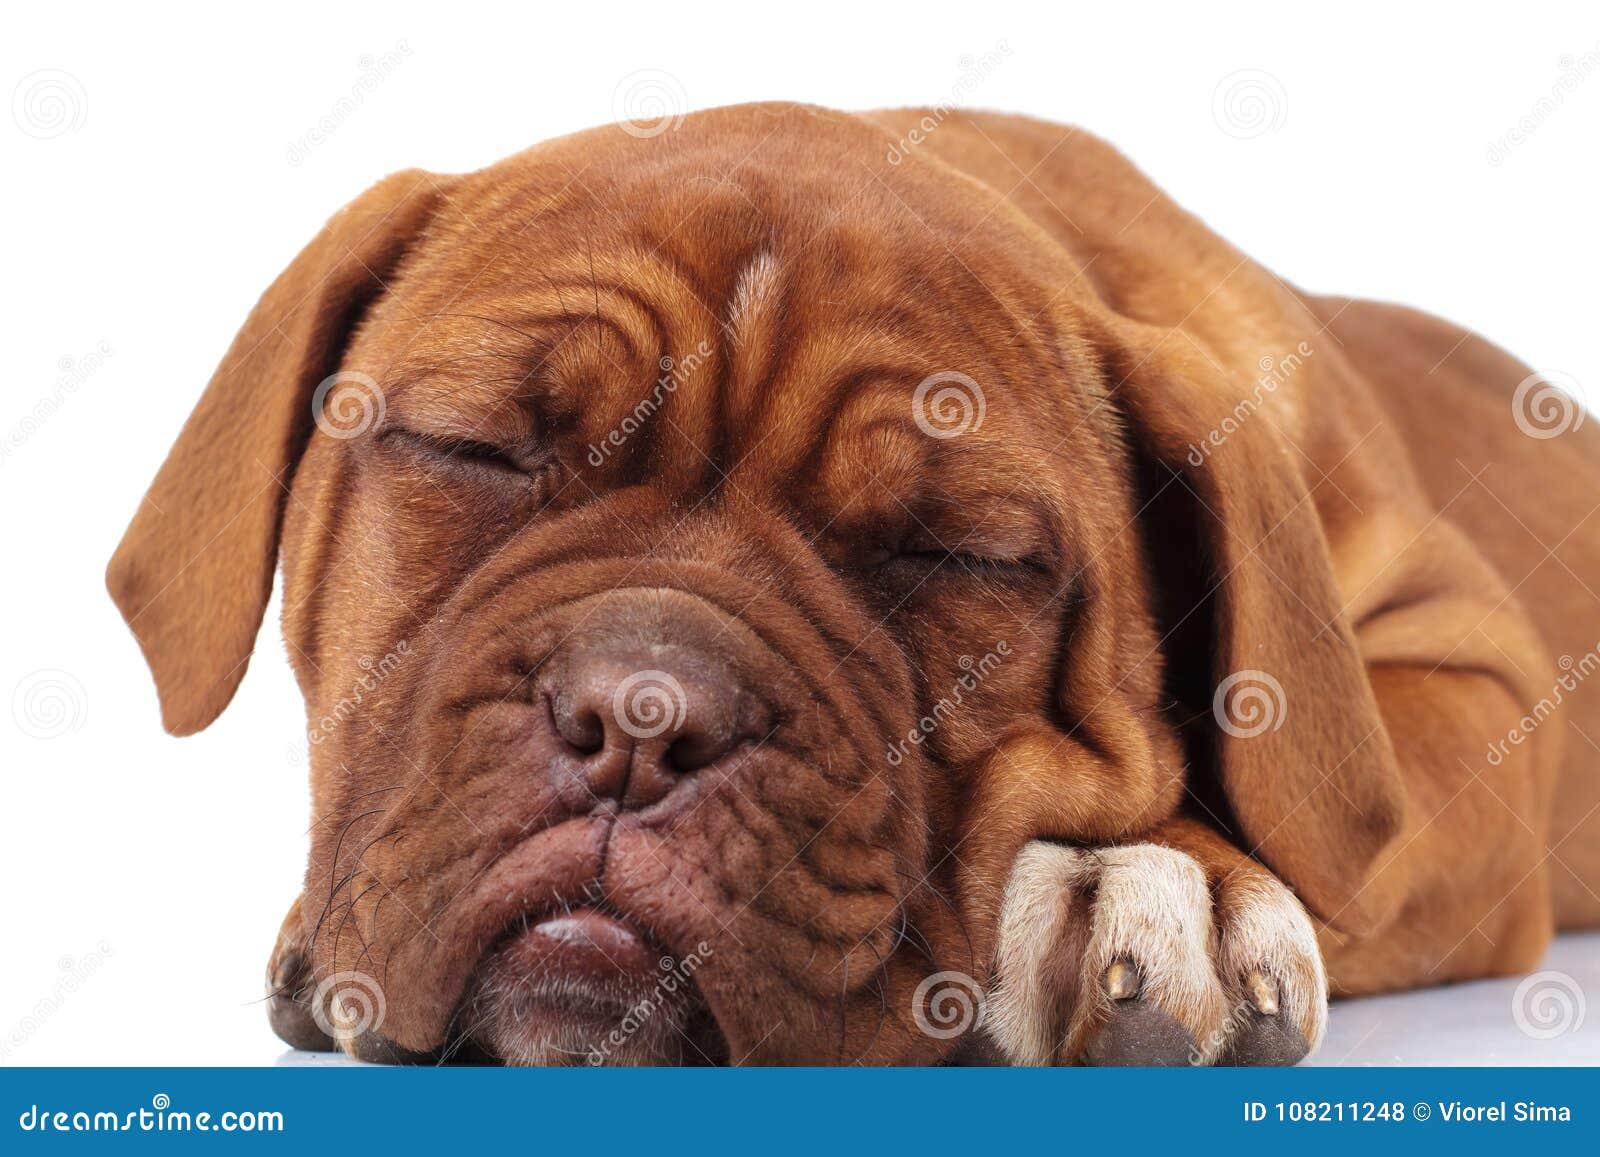 Adorable dogue de bordeaux puppy is sleeping